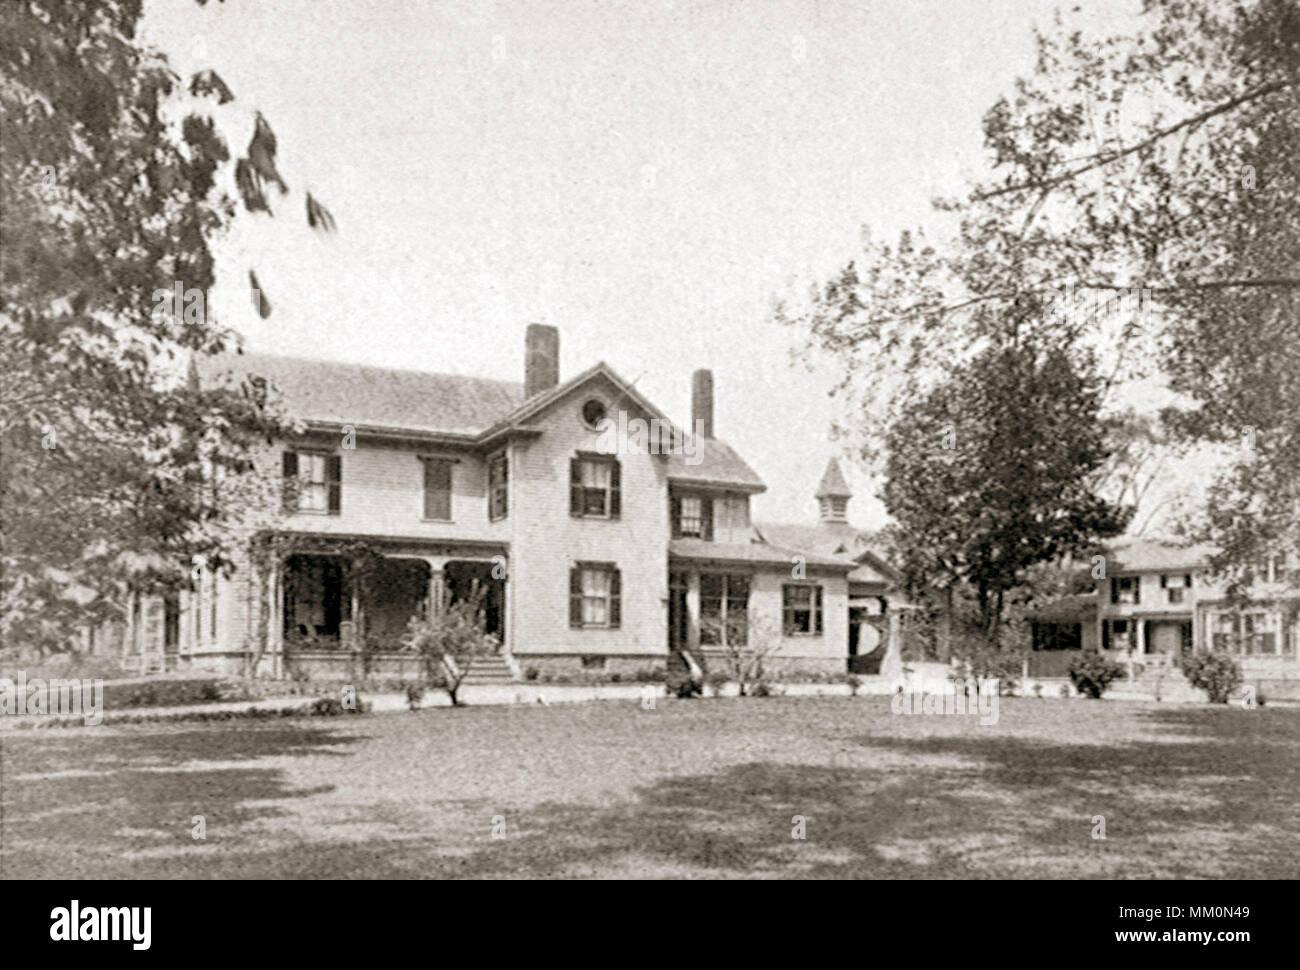 Residence of Silas D. Presbrey. Taunton. 1899 - Stock Image